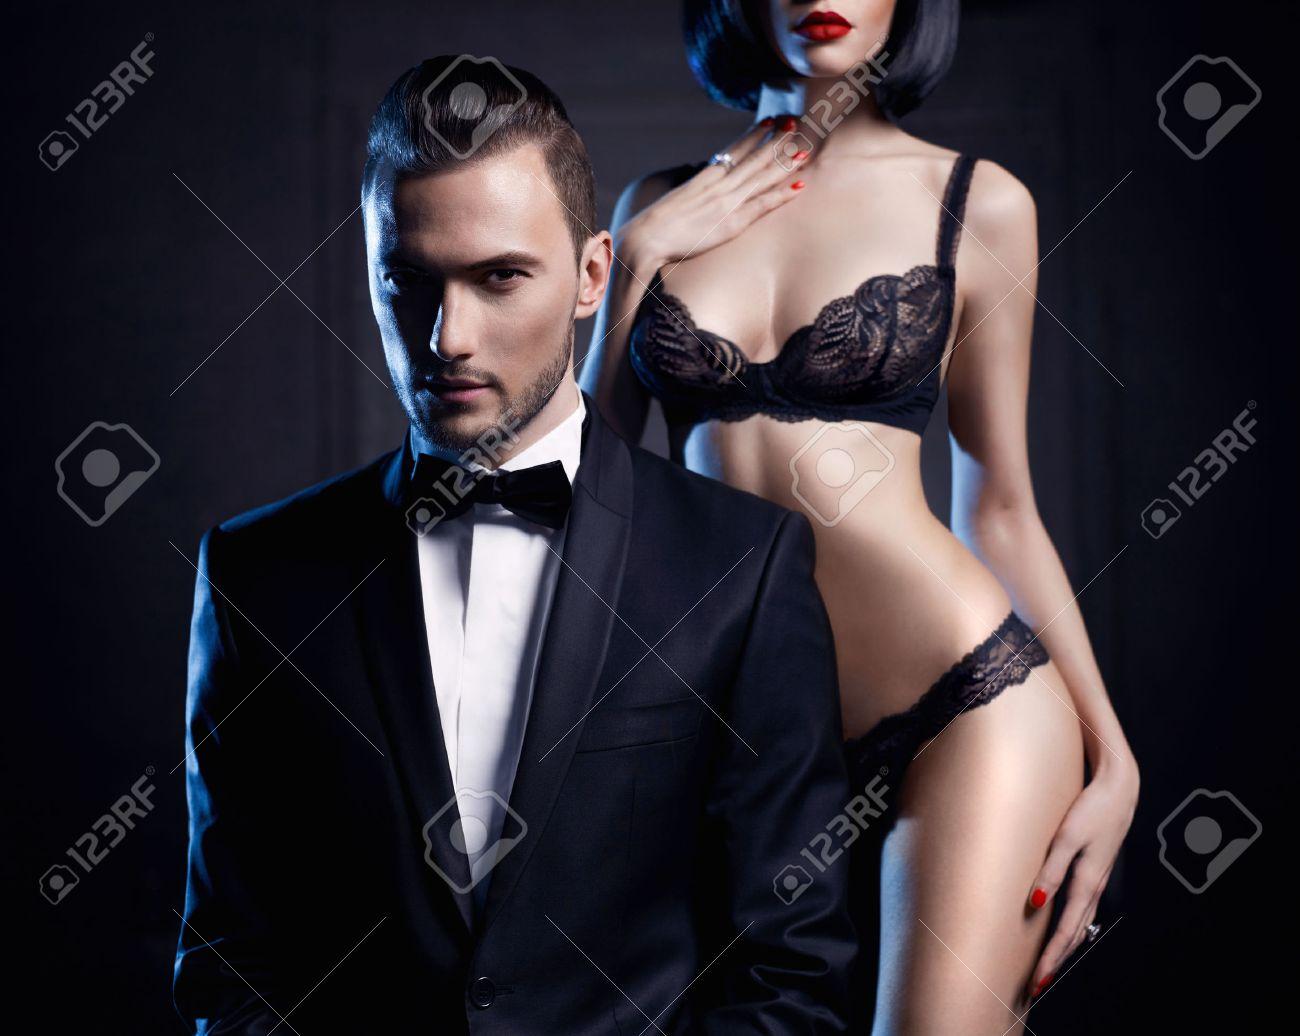 Fashion studio photo of a sensual couple in lingerie and a tuxedo Standard-Bild - 36665794